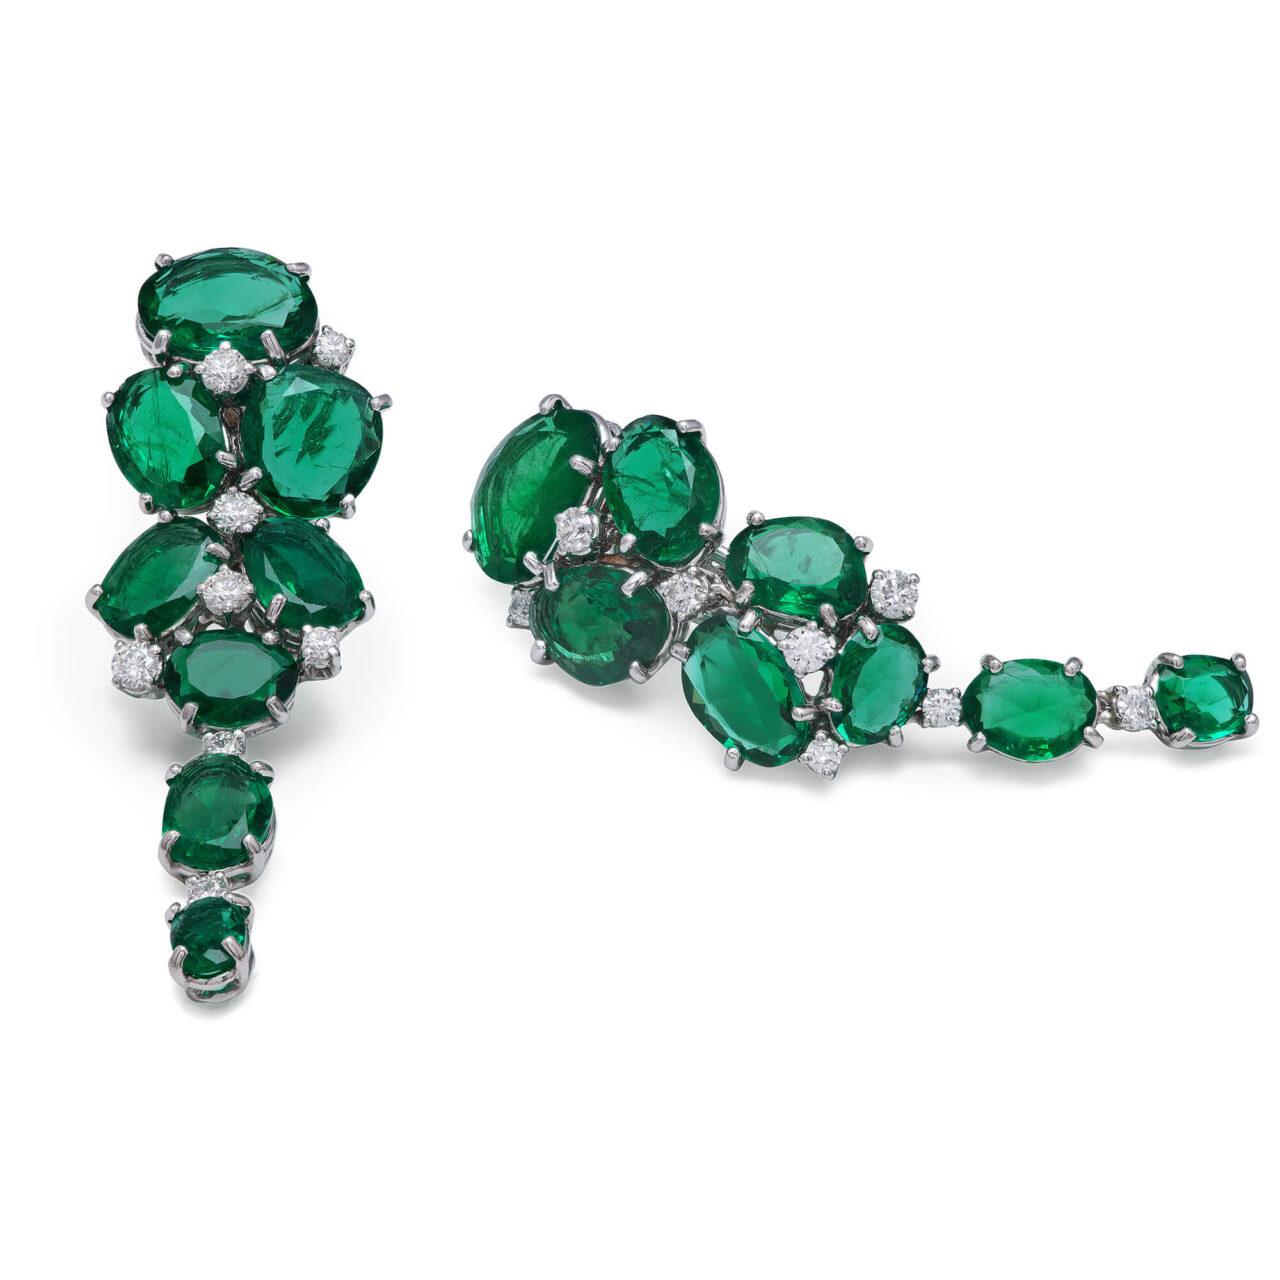 Platinum Earrings with Diamonds and Zambian Emeralds